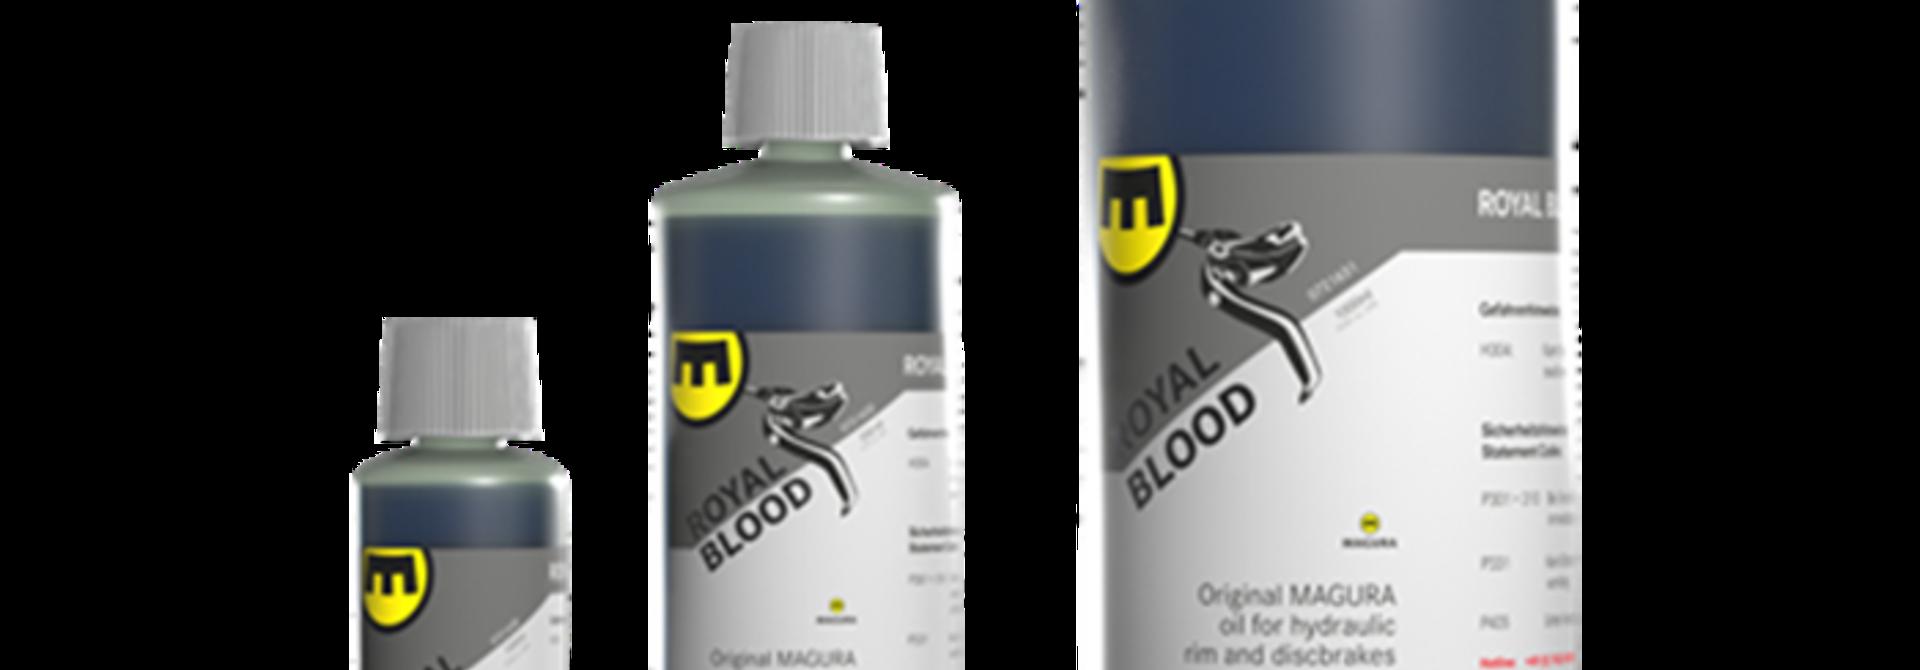 Magura Royal Blood Hydraulic Disc Oil